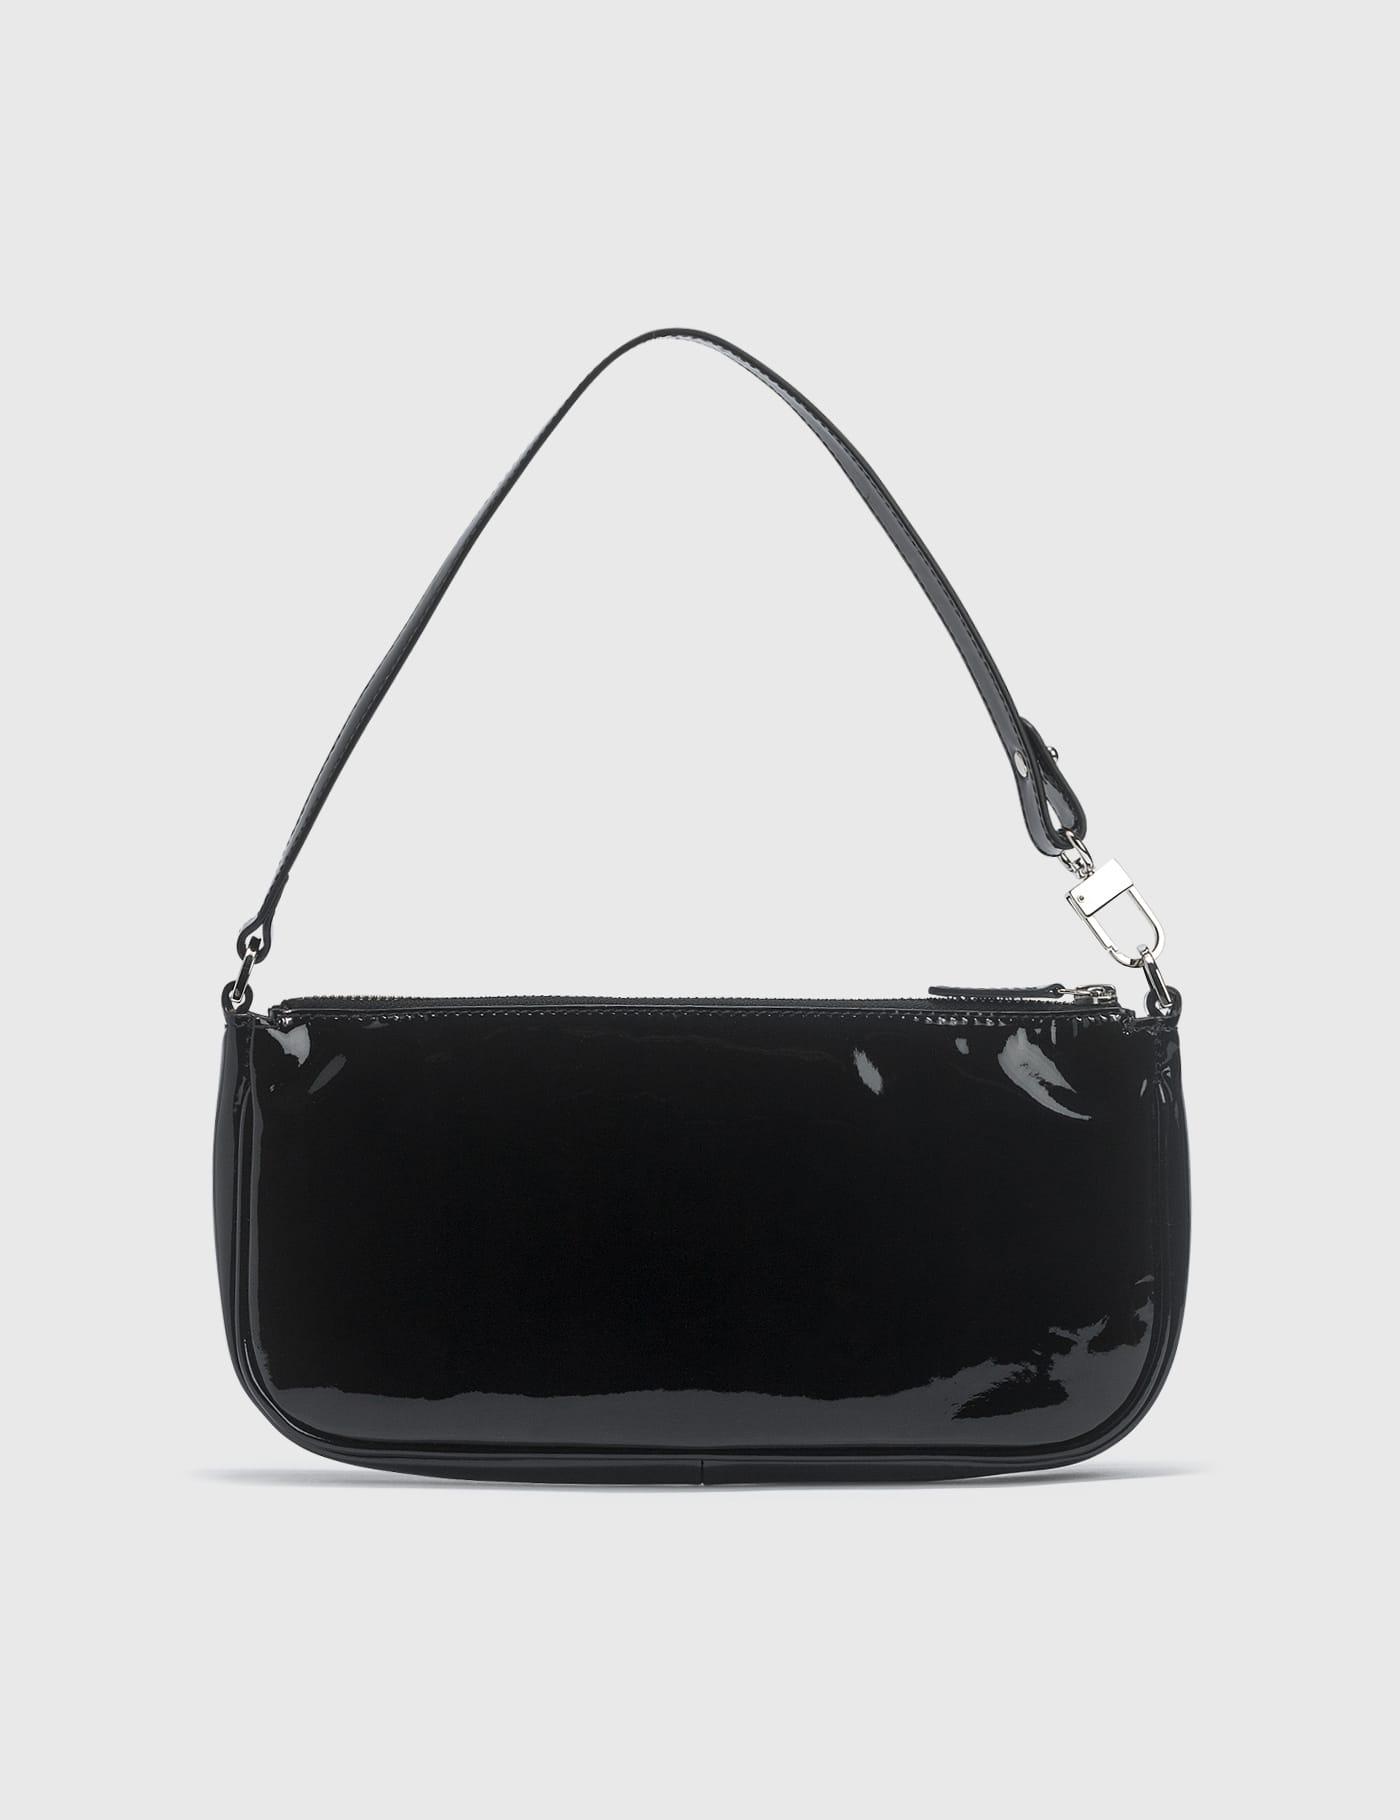 Rachel Black Patent Leather Bag